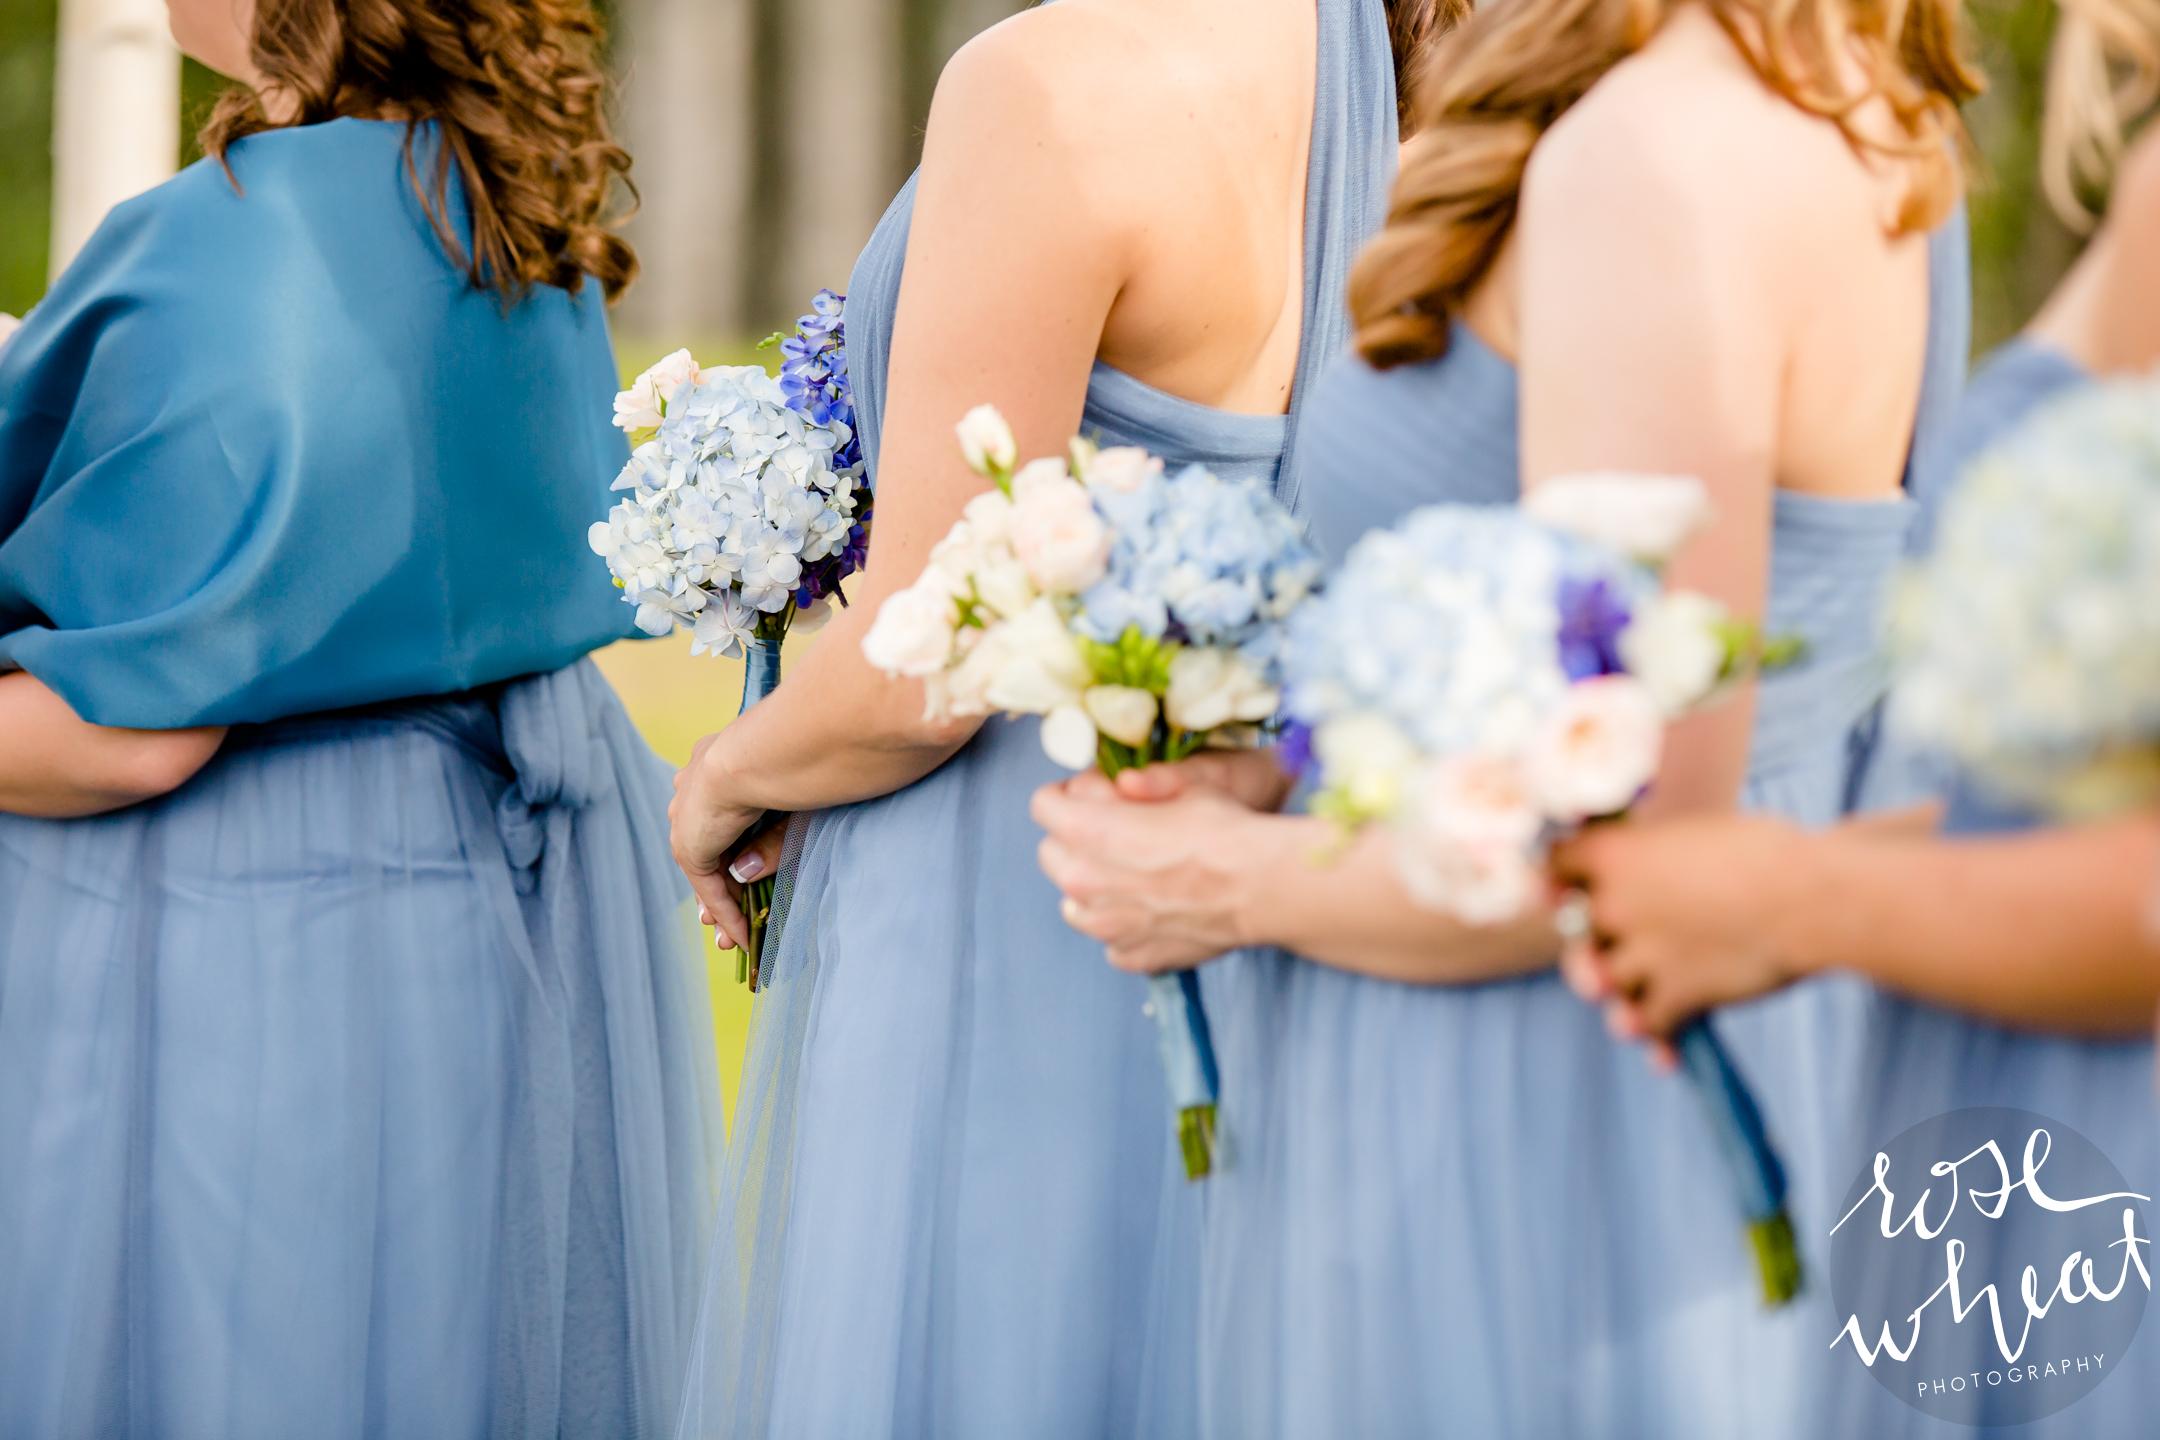 12. Birch_Hill_Fairbanks_Ak_Wedding_Rose_Wheat_Photogrpahy-1.jpg-13.jpg